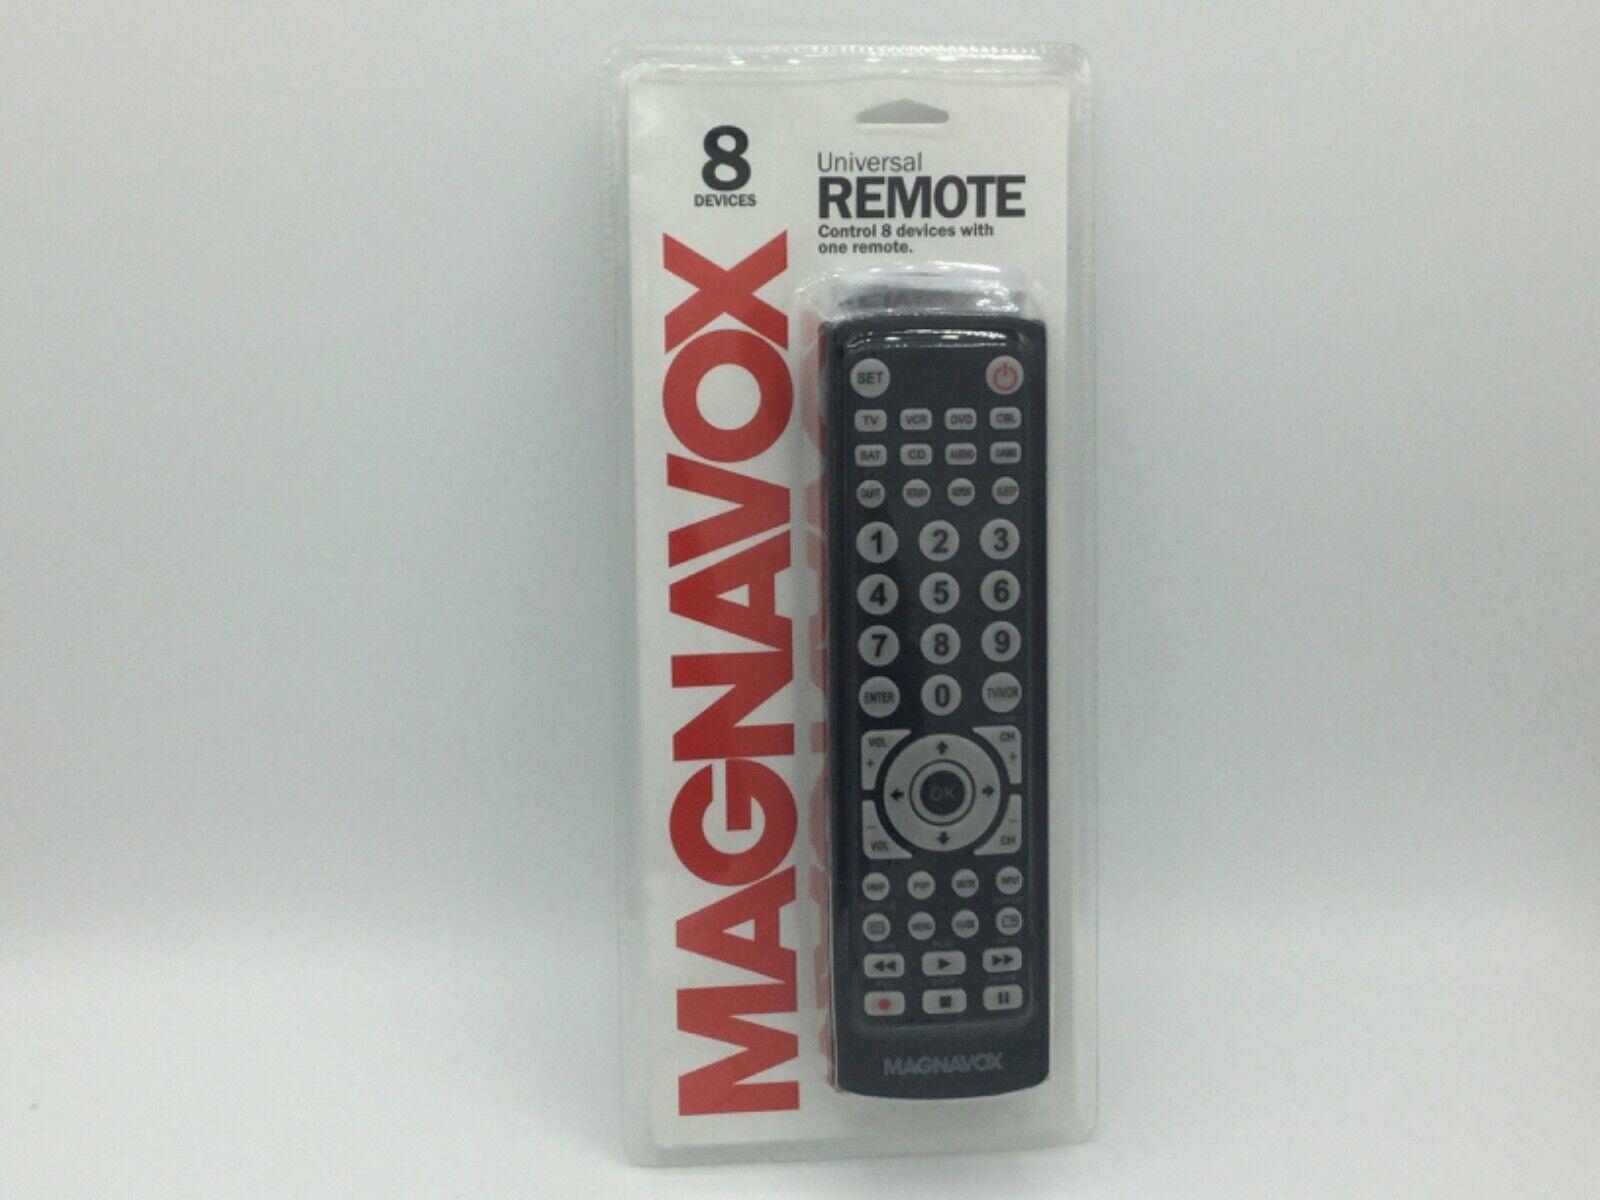 Magnavox 8-in-1 Universal Remote For TVs , Digital TVs , DVD